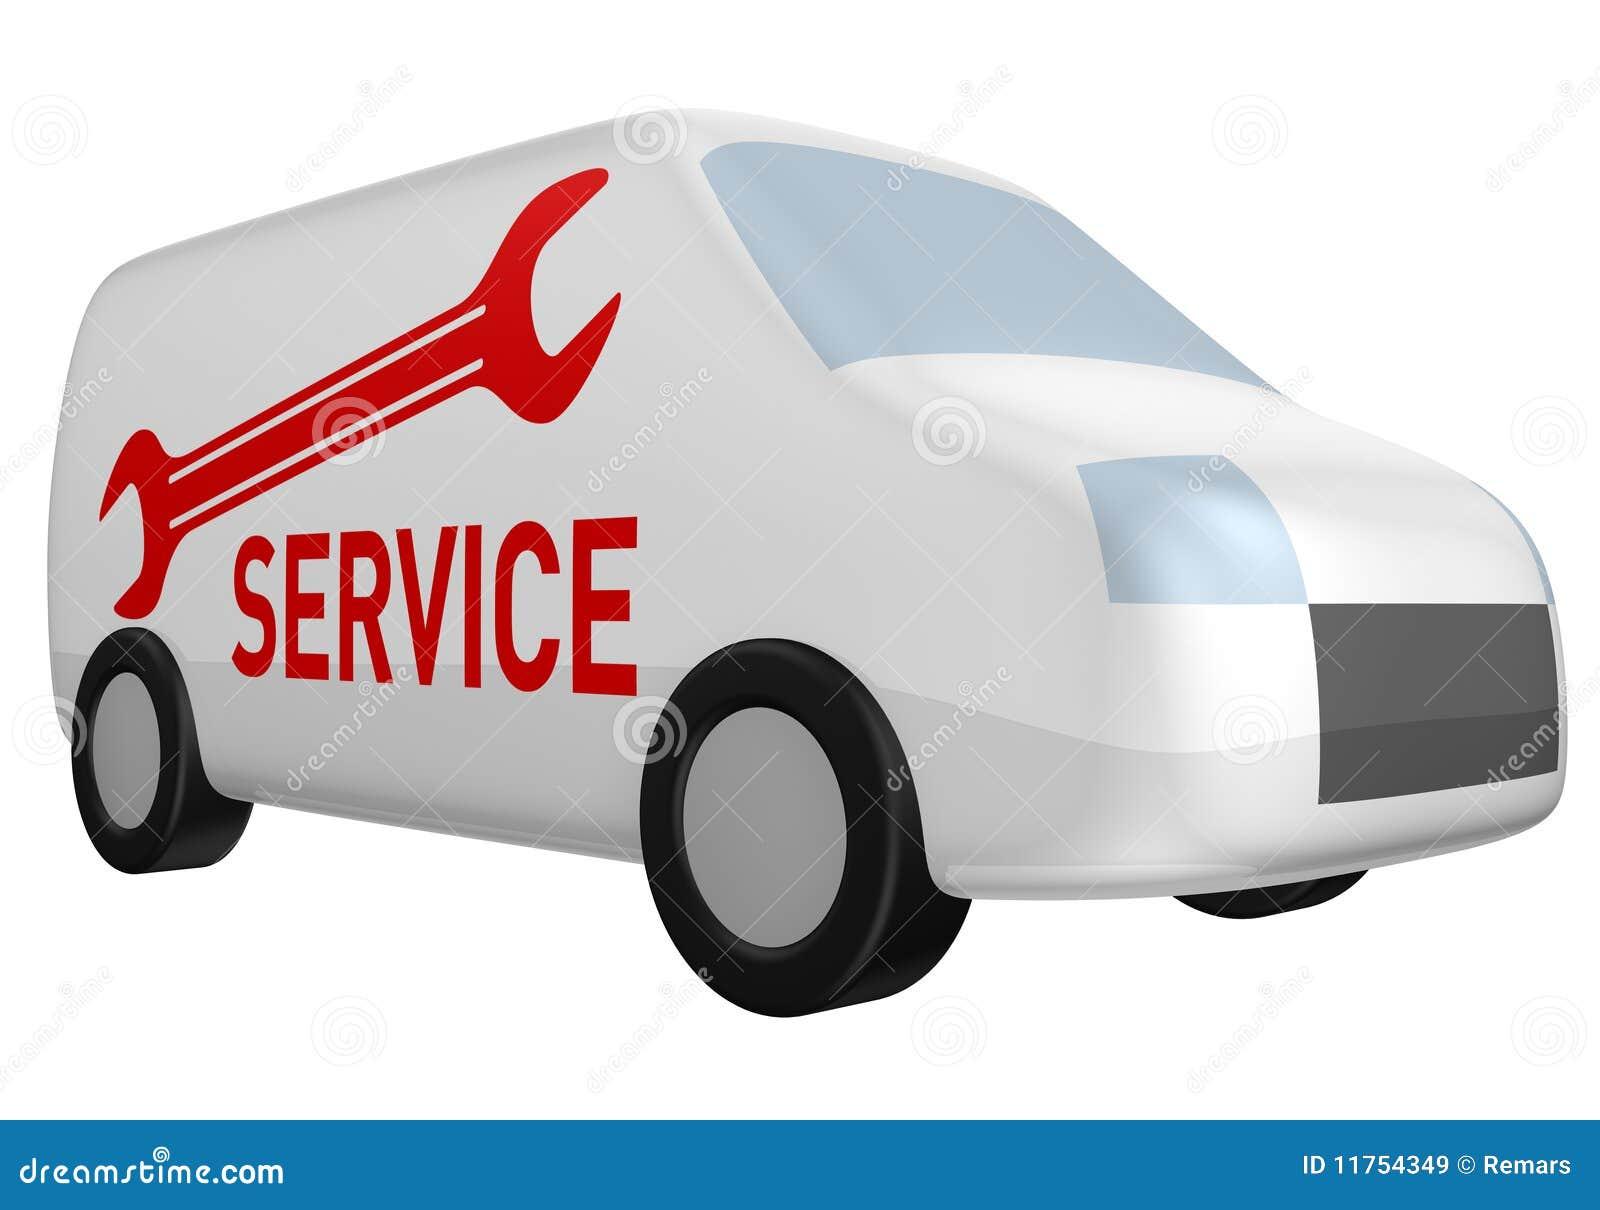 eef5bd85e1e9 Delivery van service stock illustration. Illustration of motion ...